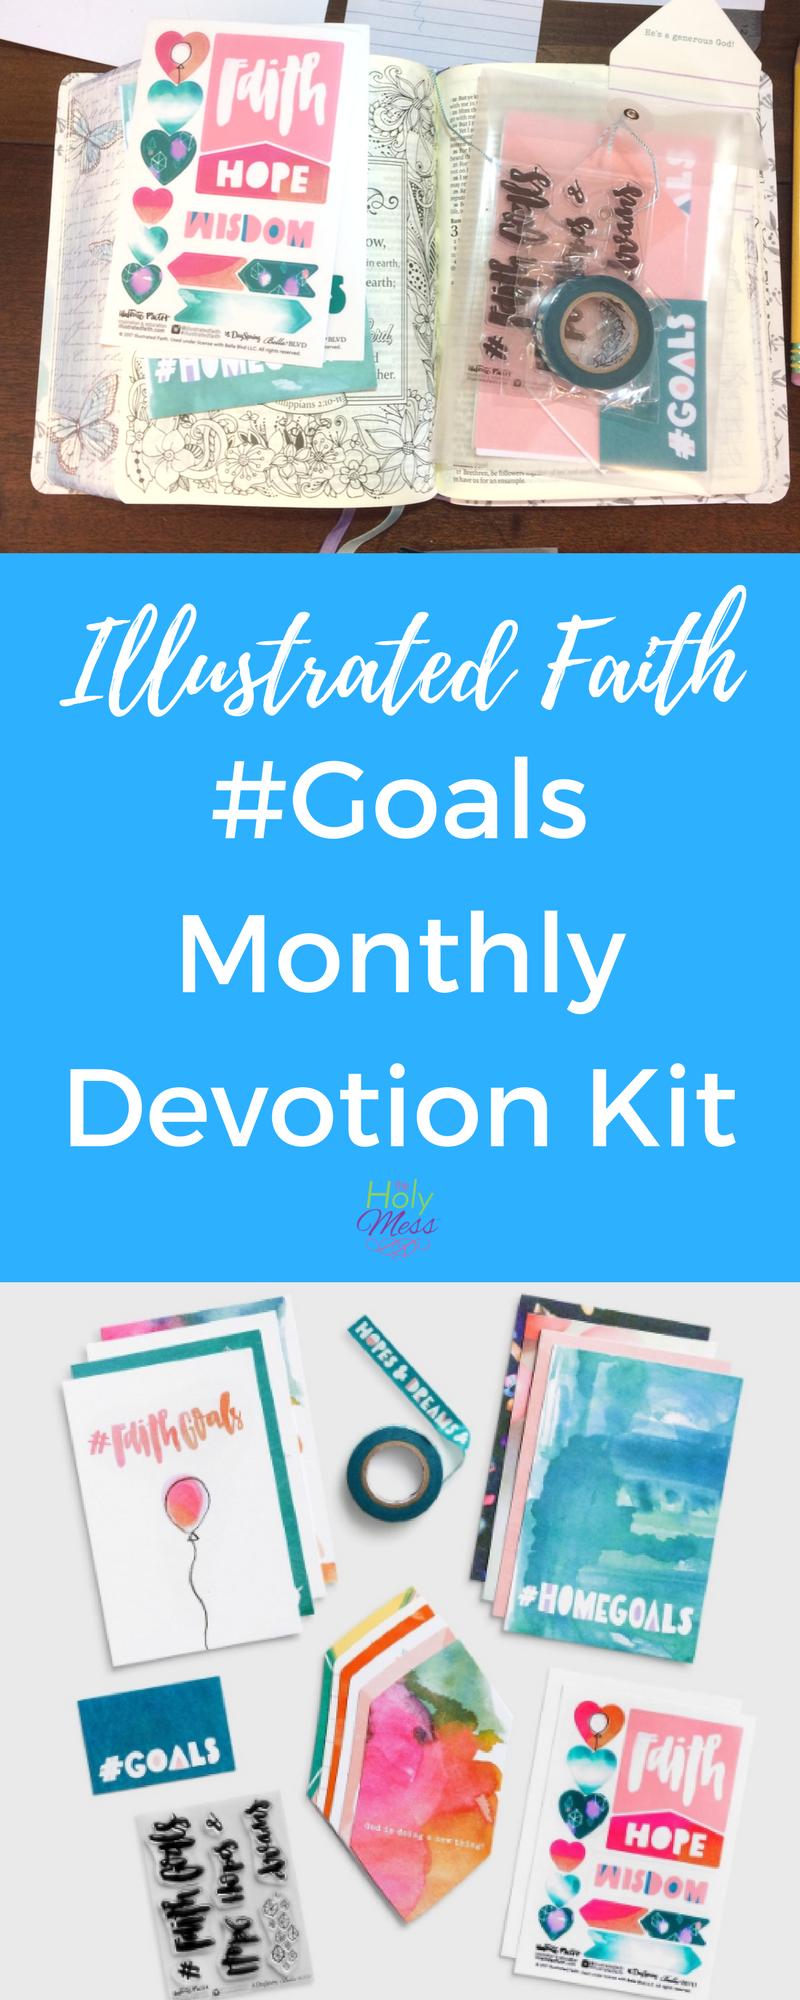 Illustrated Faith #Goals Monthly Devotion Kit